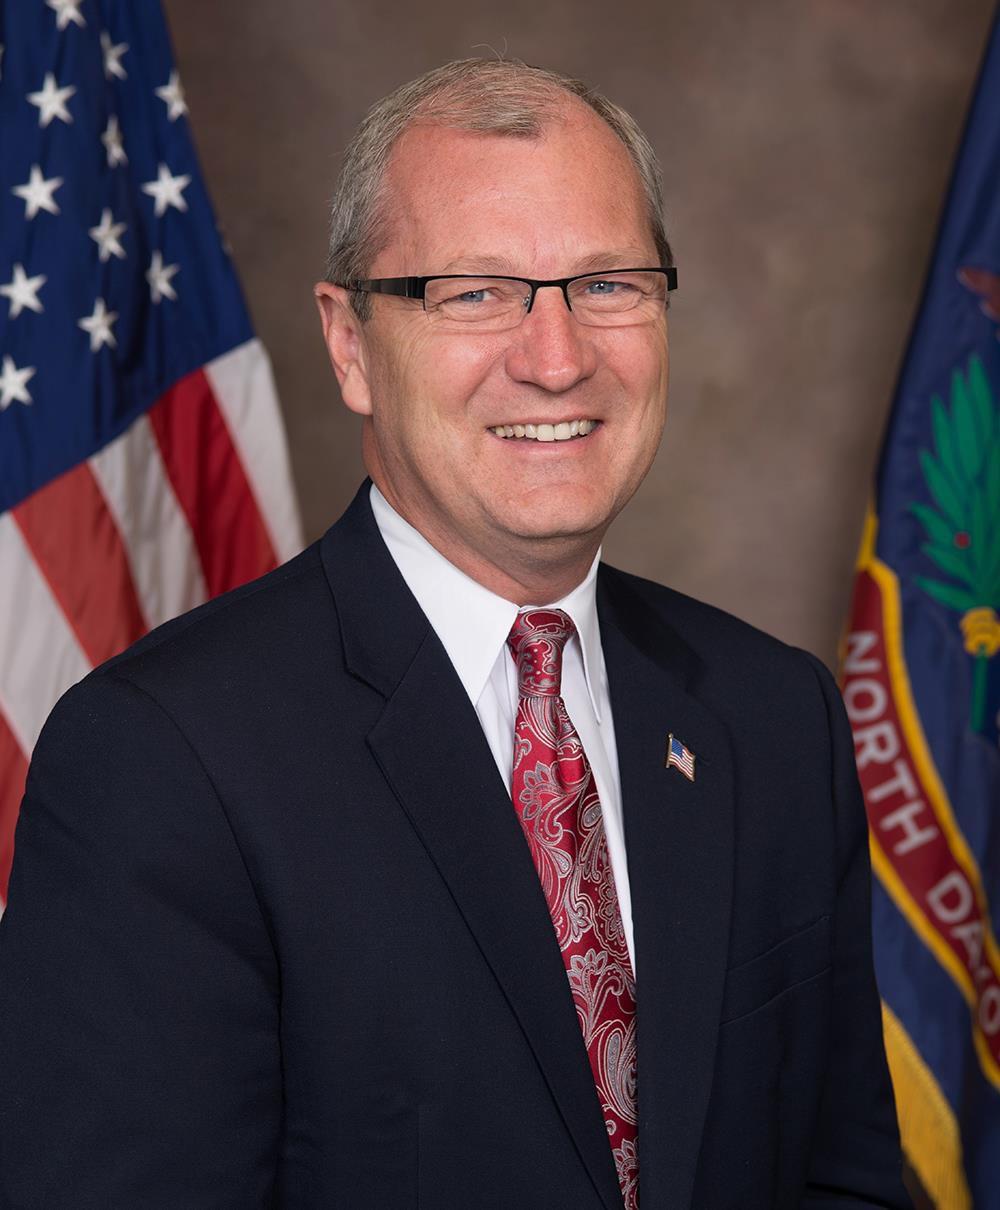 Kevin_Cramer,_official_portrait,_113th_Congress.jpg